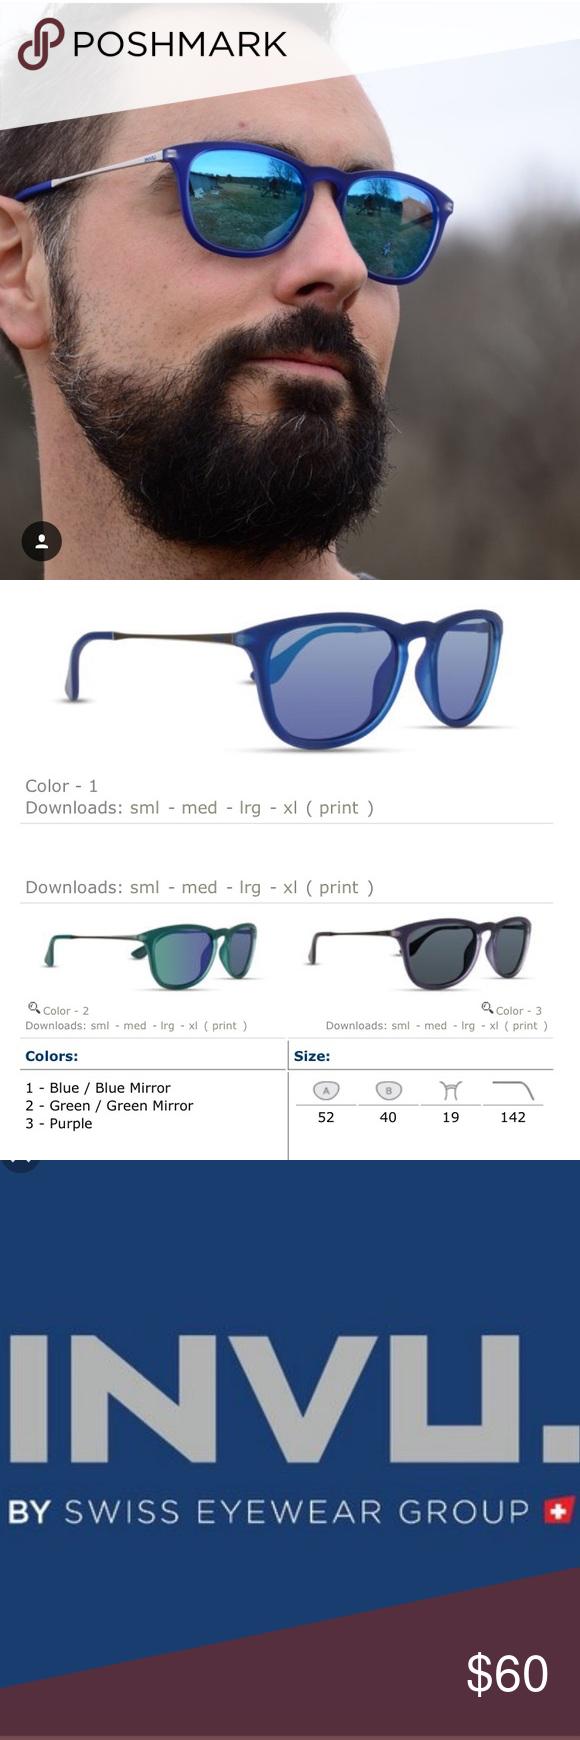 Invu Sunglasses For Men 100 Uv Protection All Colors Available 100 Original Retail Price Feel Free Sunglasses Men Sunglasses Accessories